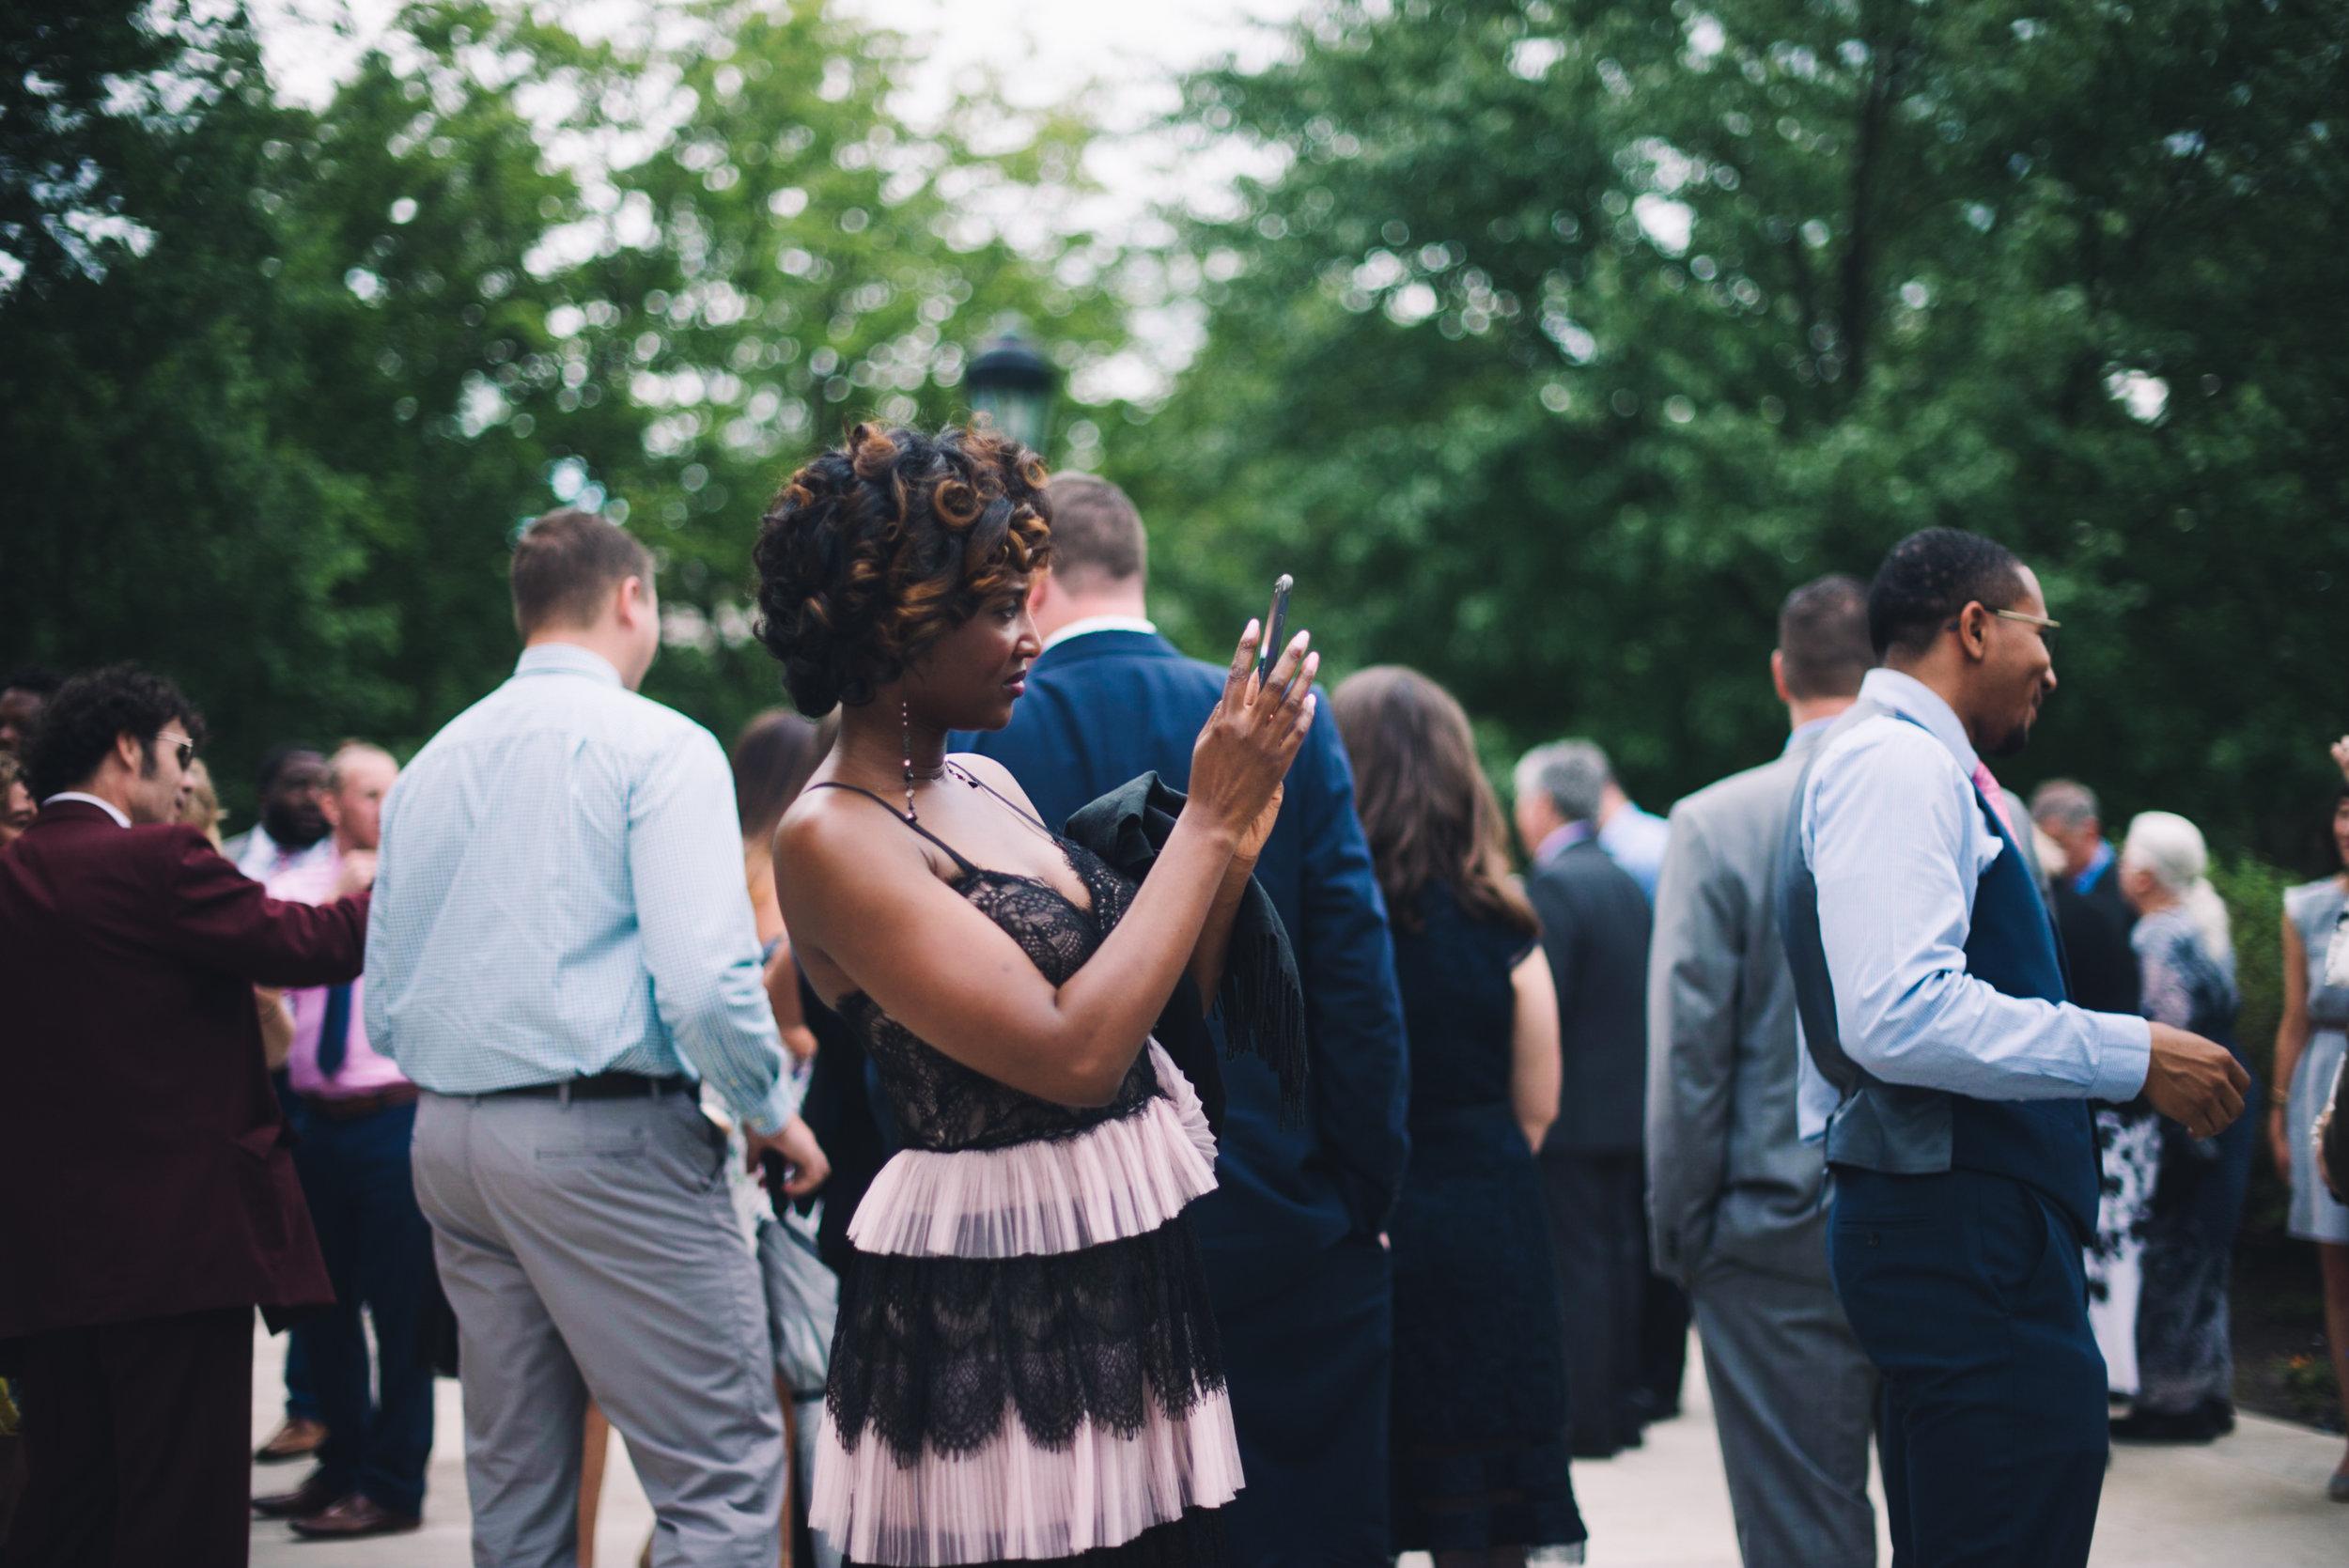 Pittsburgh Pennsylvania New York NYC Wedding Photographer Photojournalist Luxury Downtown Opera - Stirpe 749.jpg